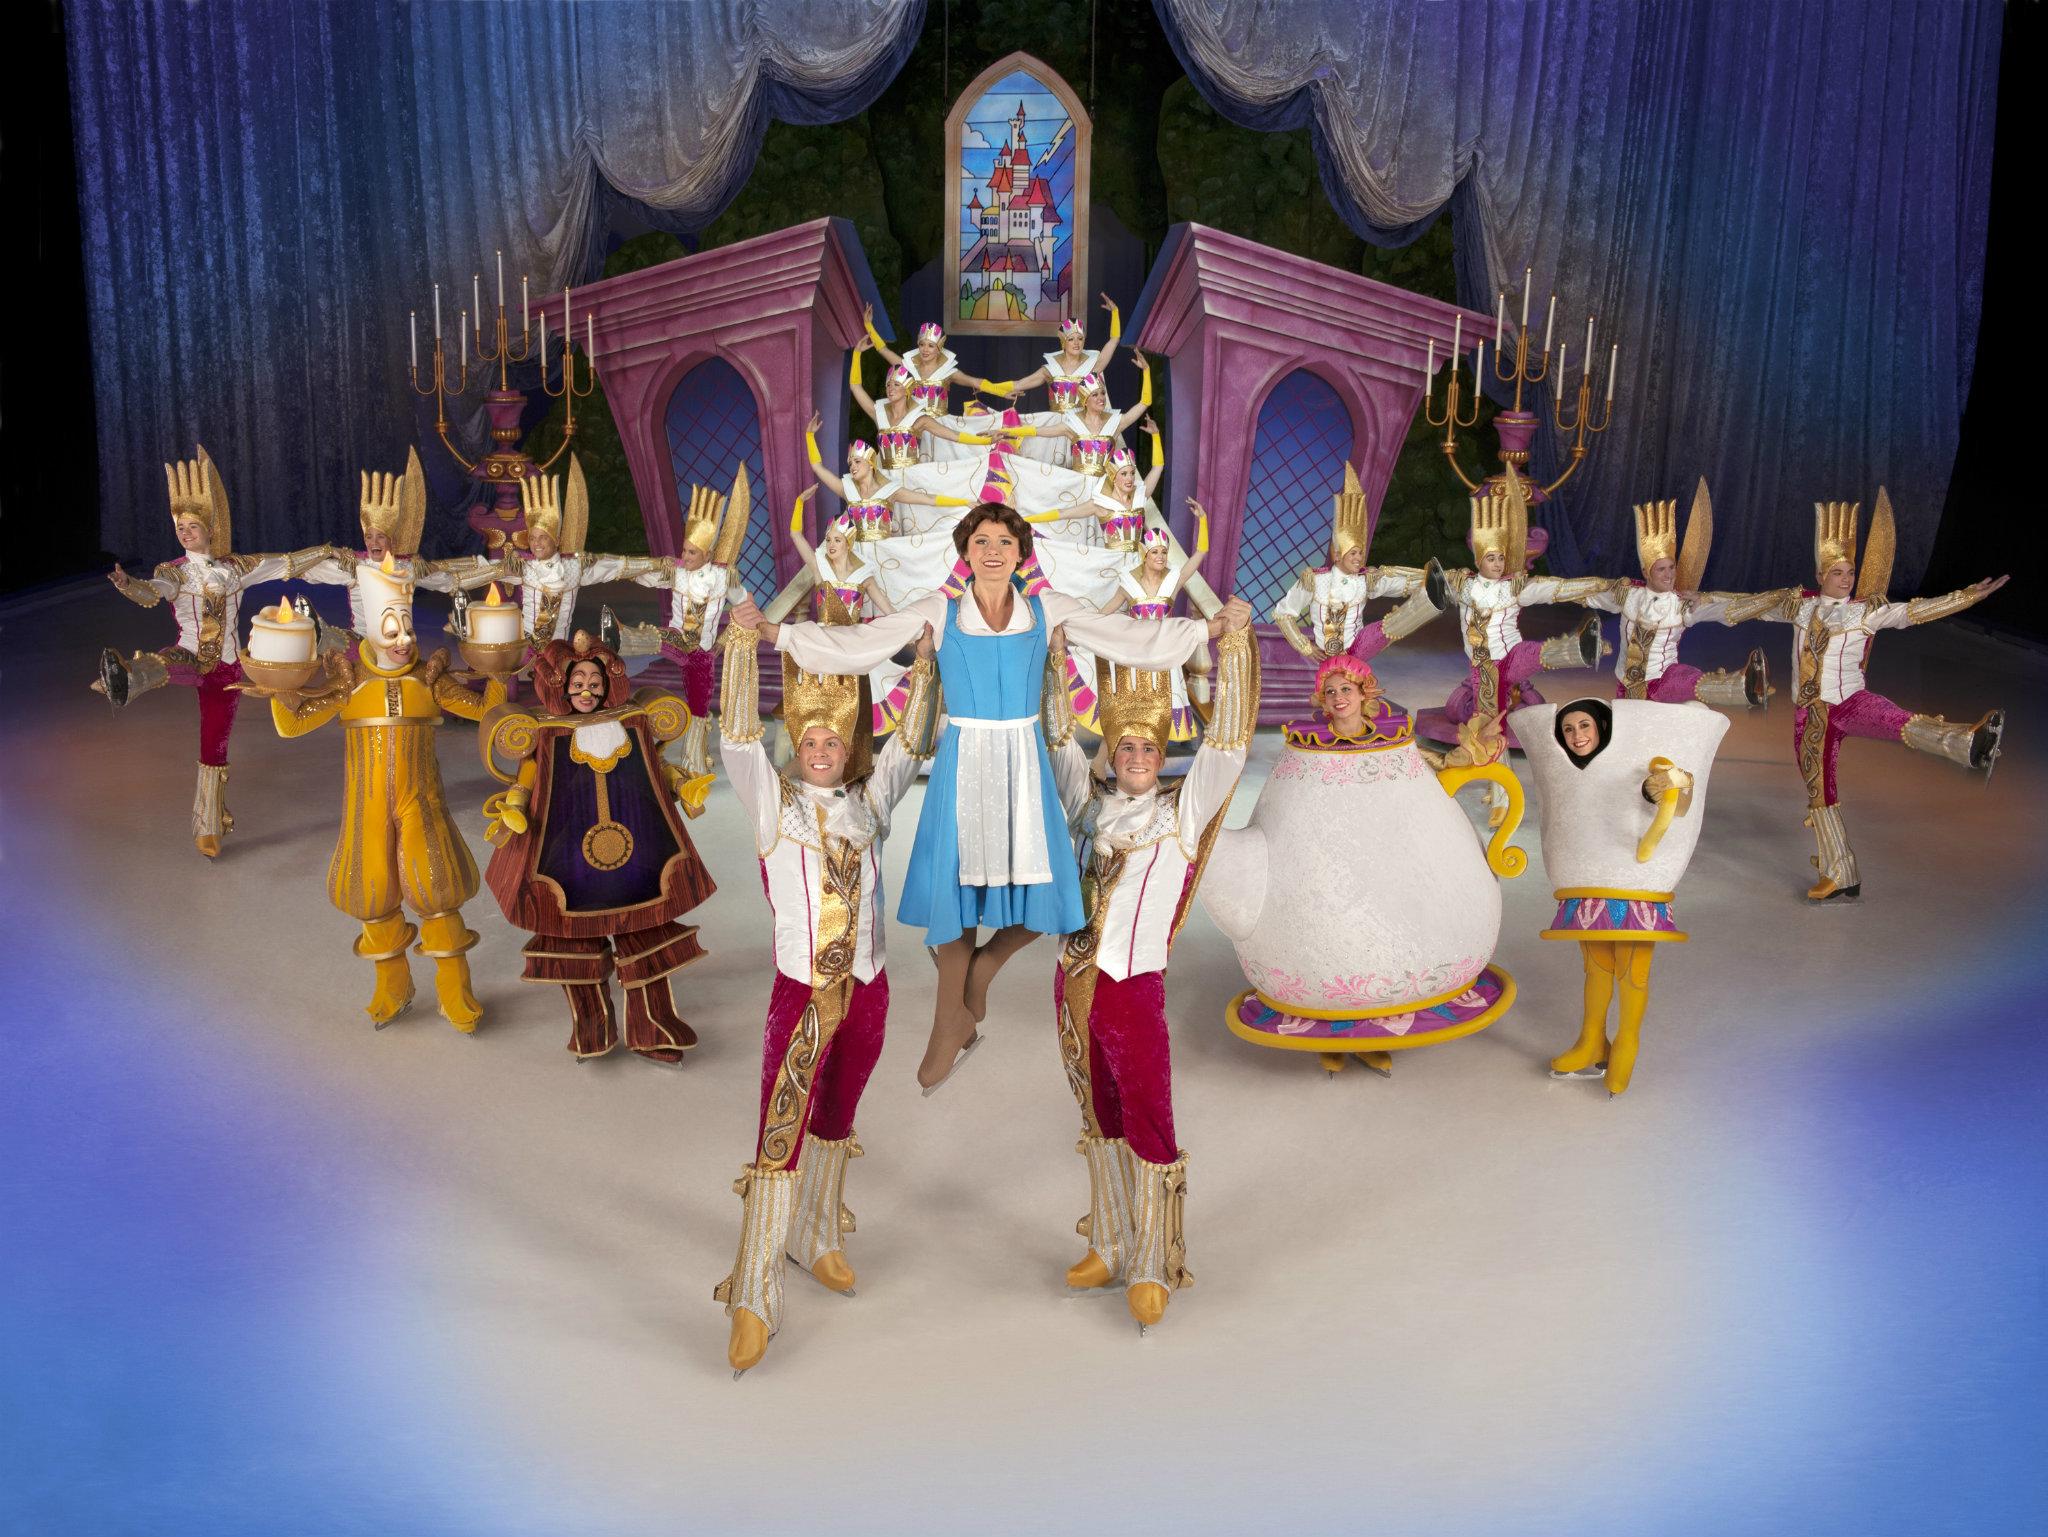 Festival mágico sobre hielo